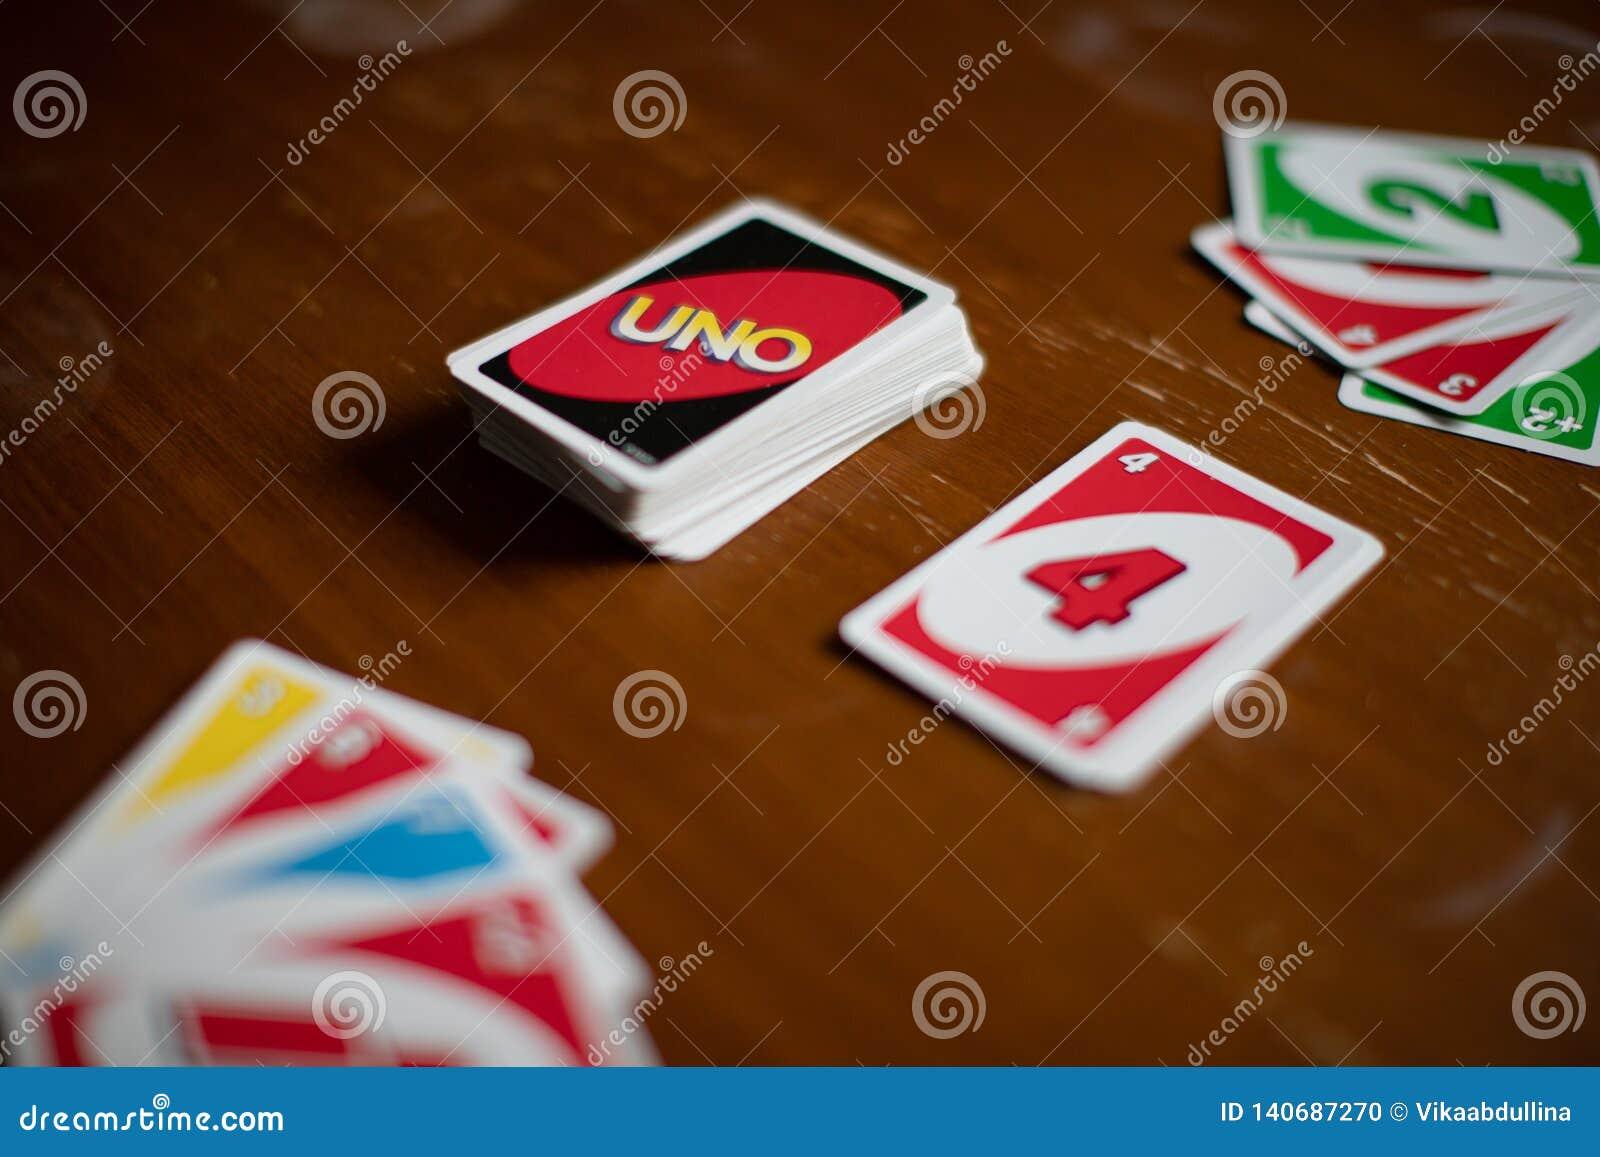 Uno到处在桌上驱散的游戏卡甲板  美国打牌